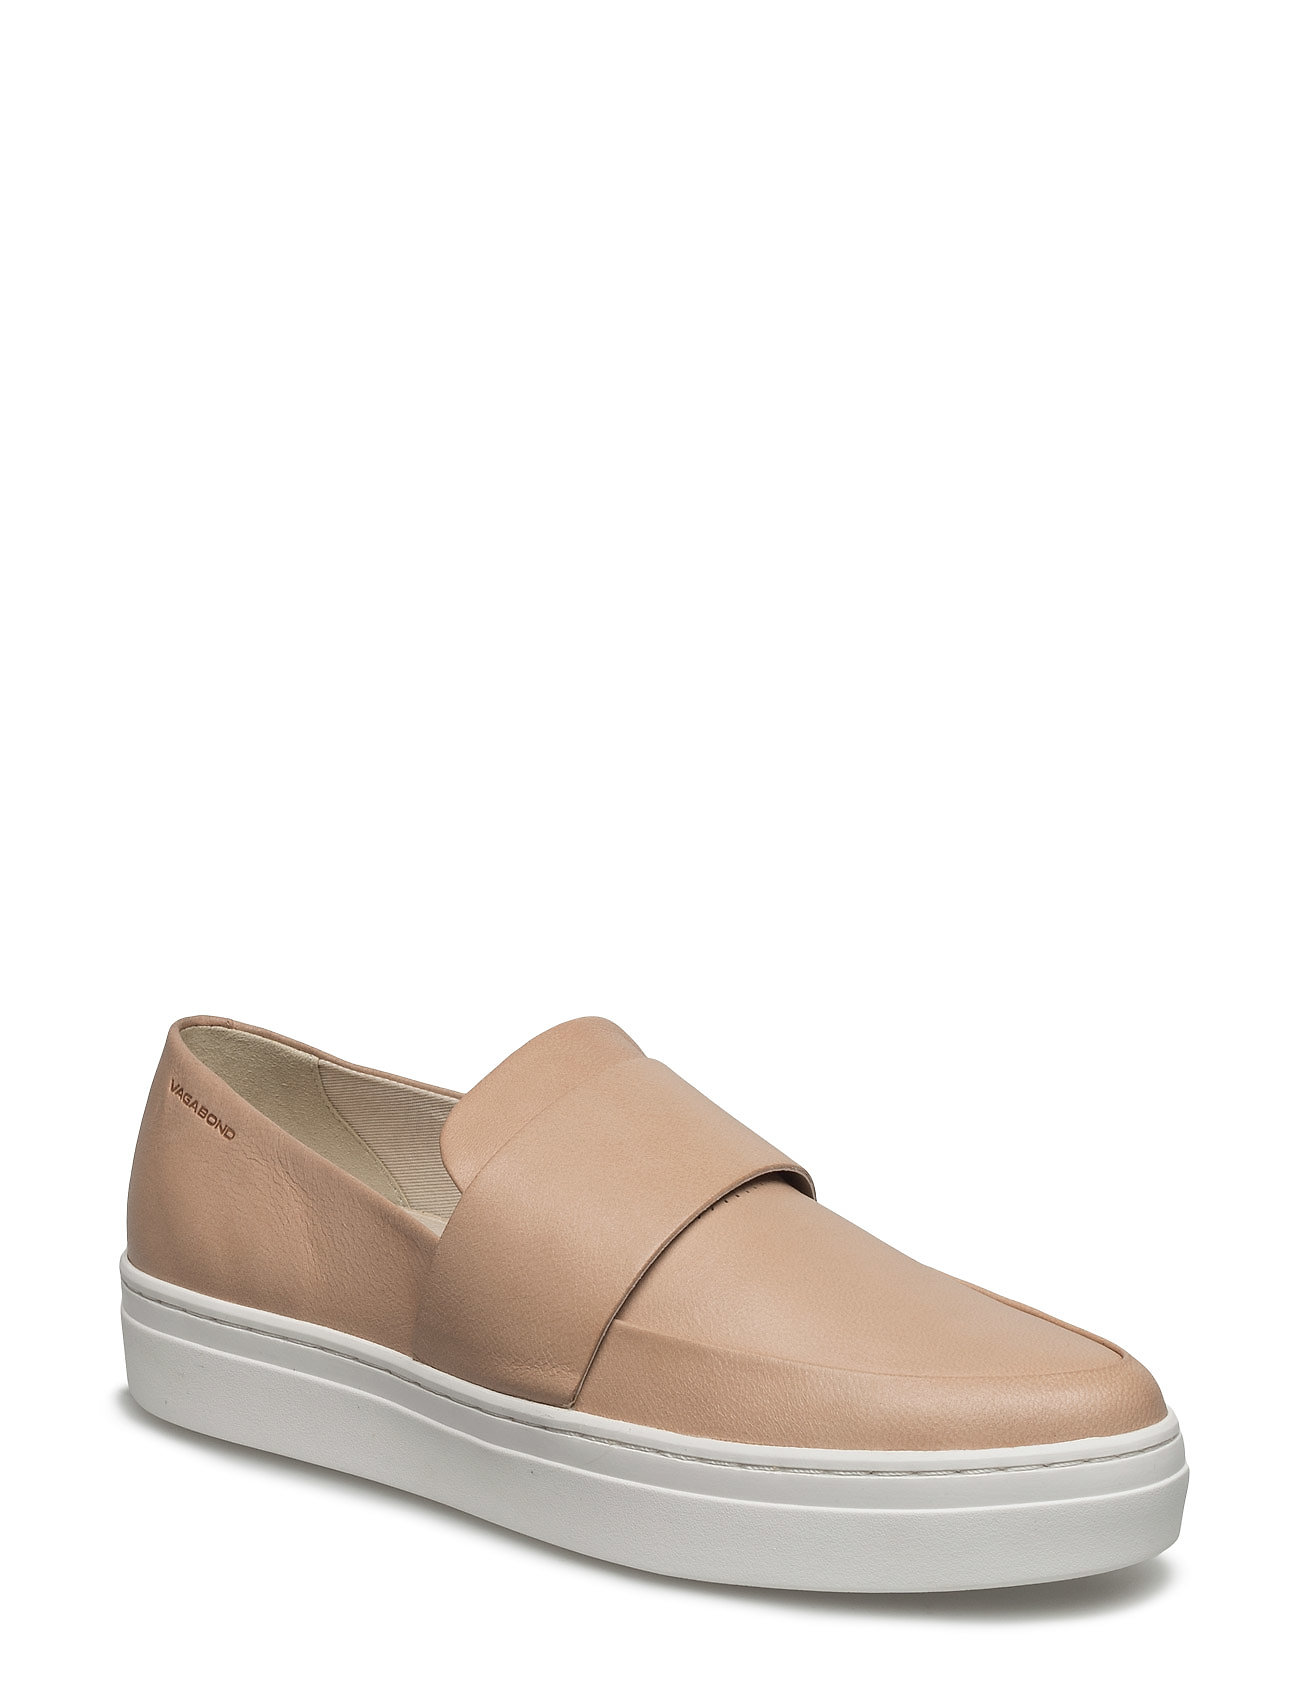 Camille VAGABOND Sneakers til Damer i